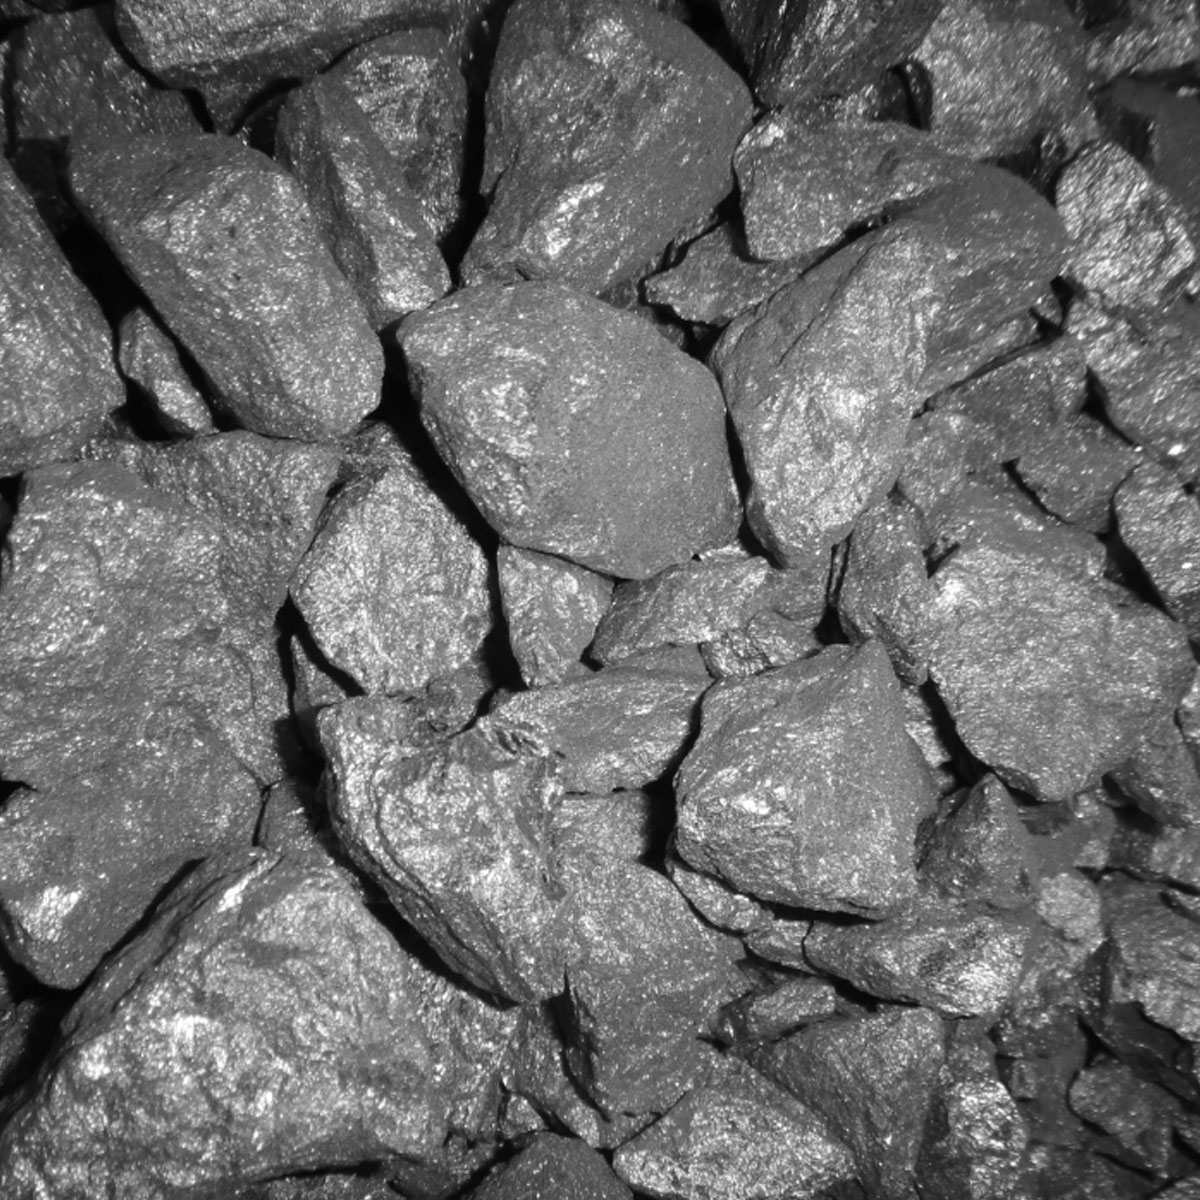 An image of the mineral Boron (Boric Acid)